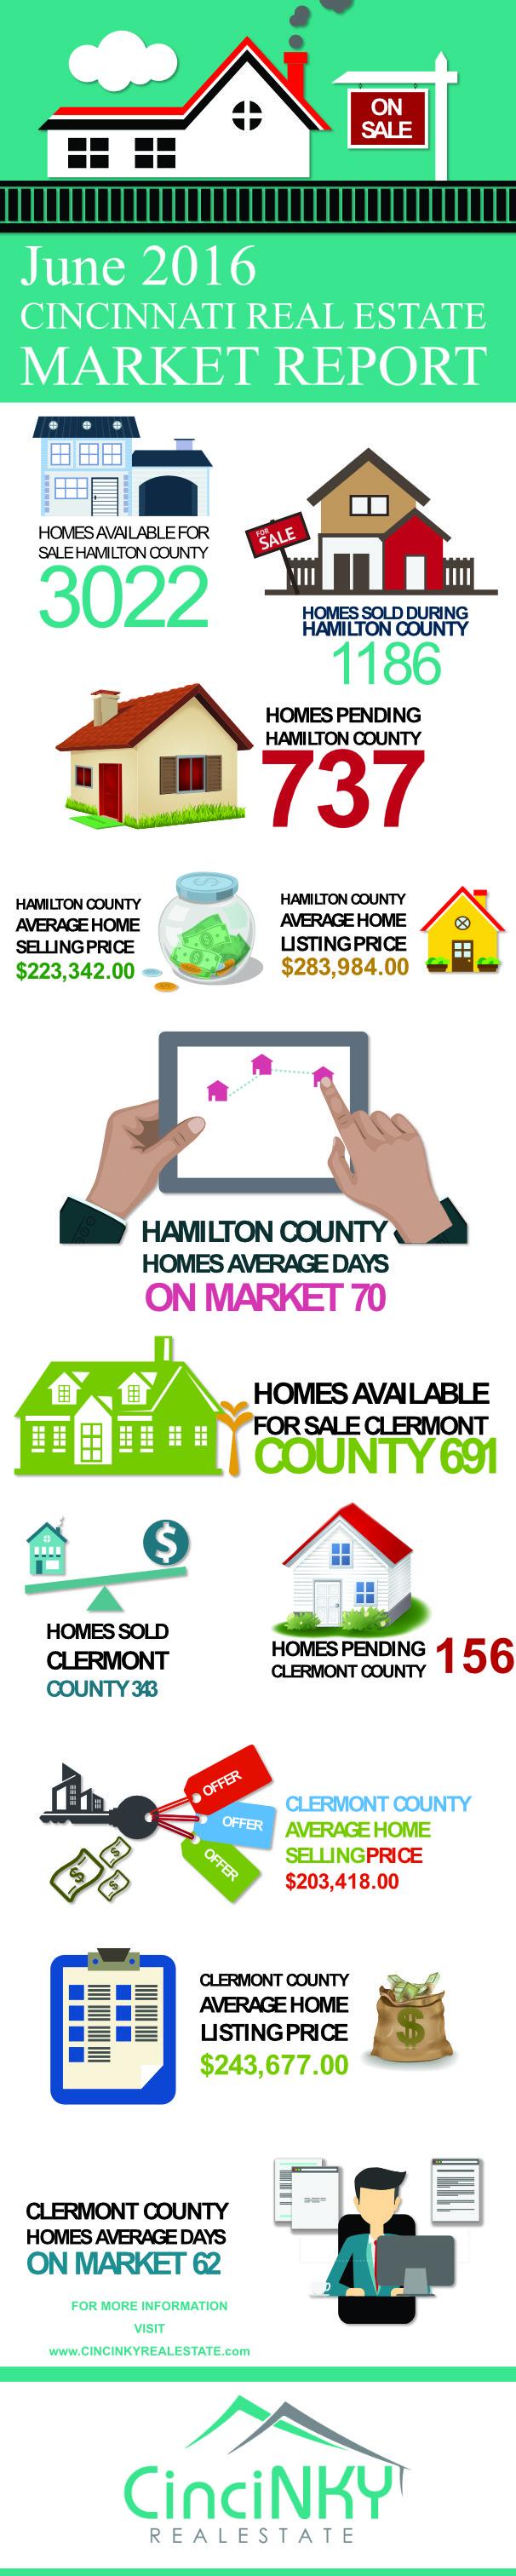 june 2016 cincinnati real estate market report infographic